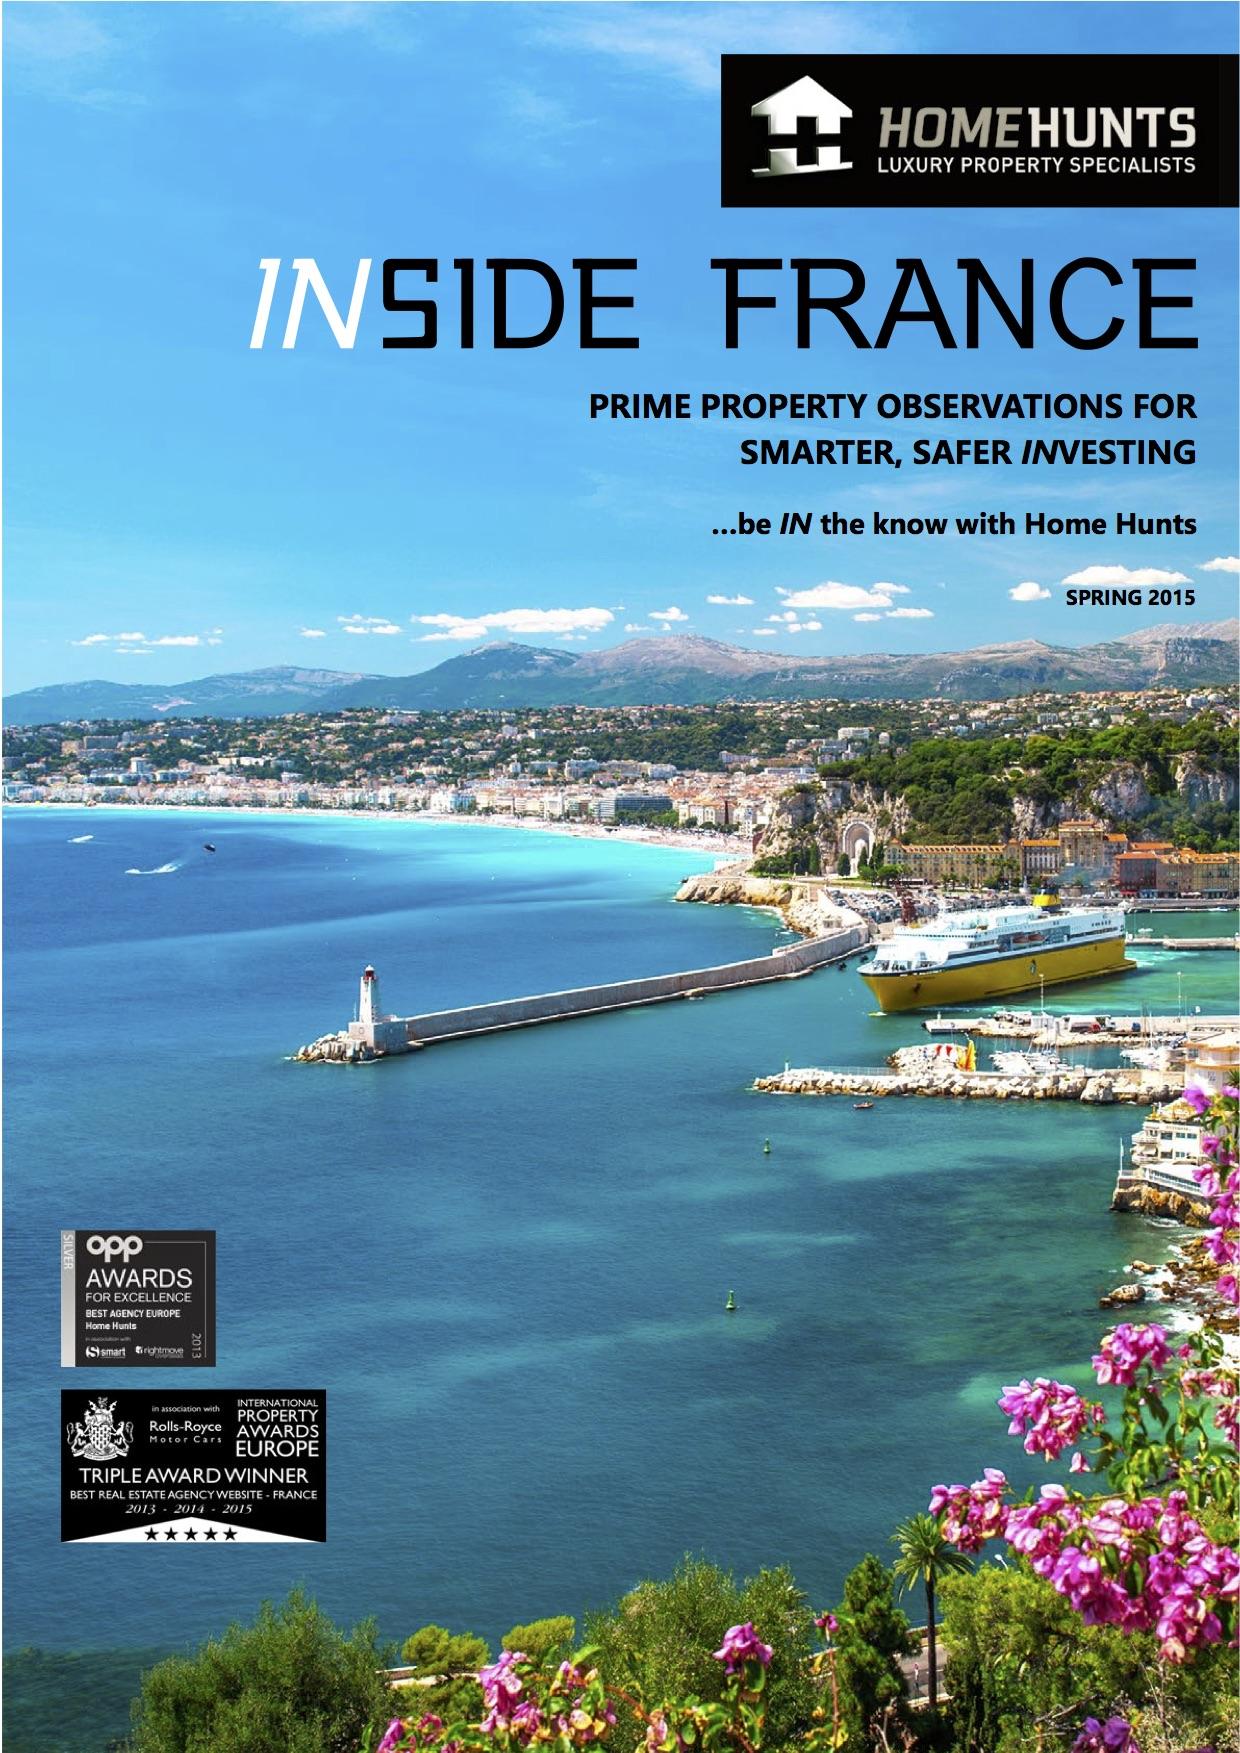 INSIDE FRANCE – Home Hunts French property market report